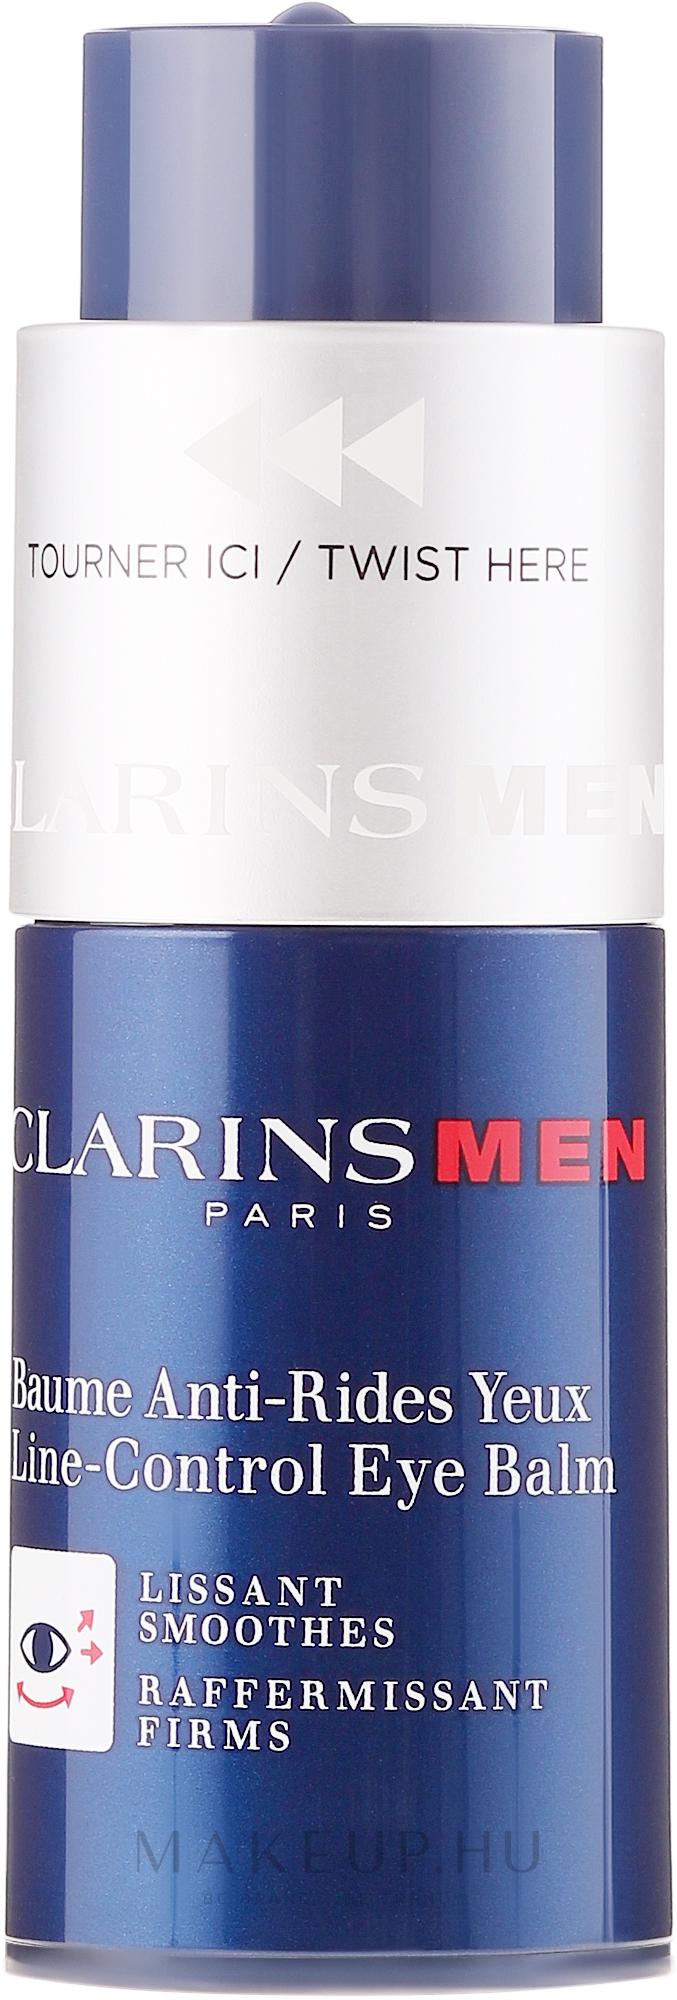 Öregedésgátló balzsam - Clarins Men Line-Control Eye Balm..